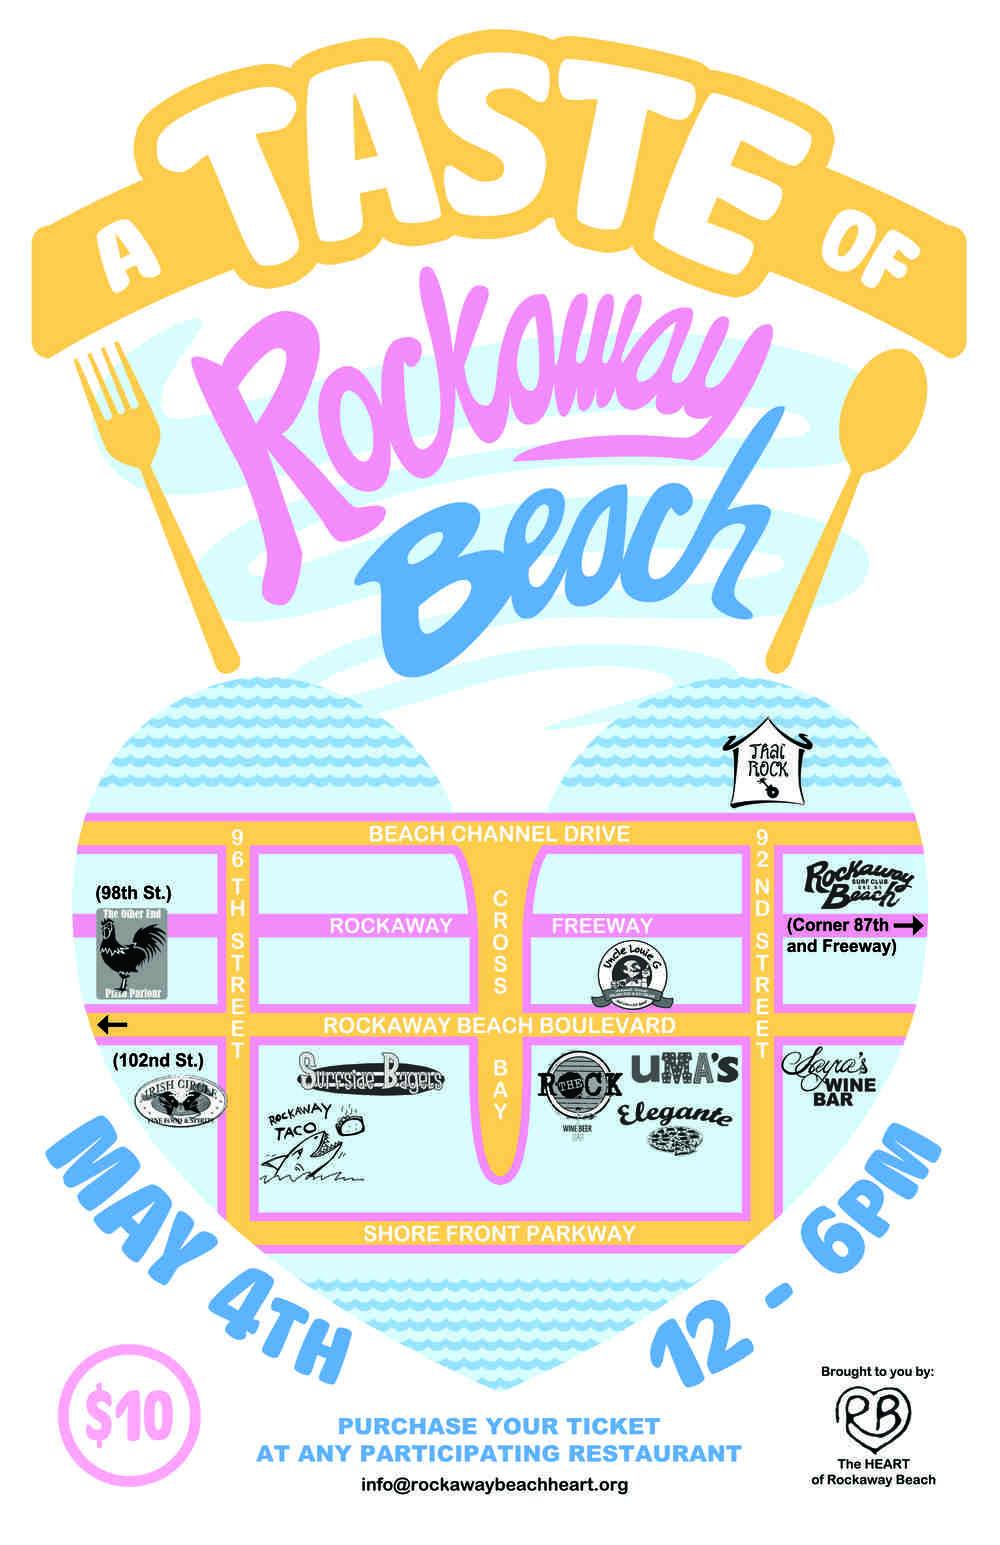 taste of rockaway rbsc 2014